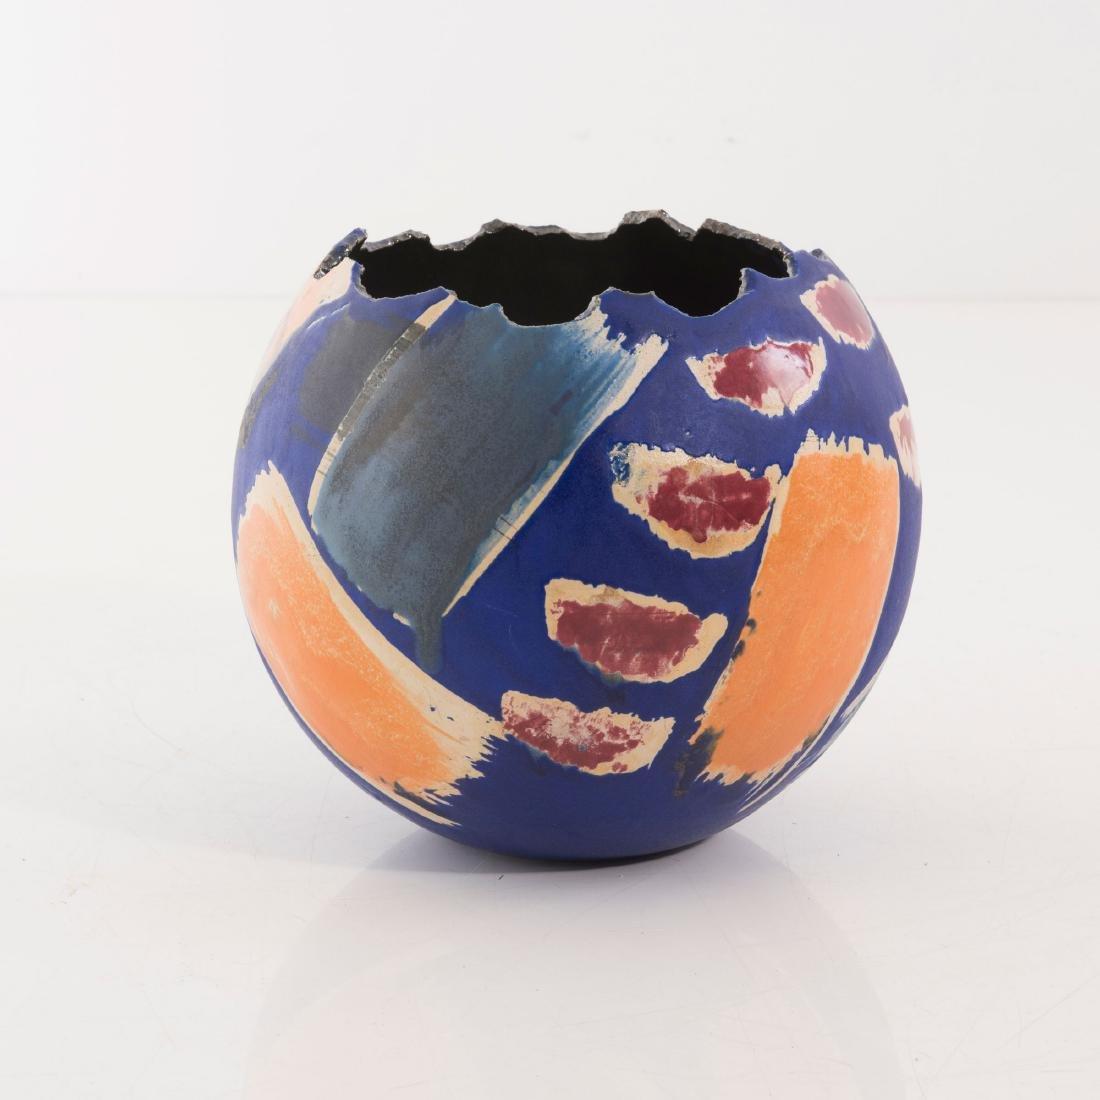 Small 'Markierungen' object, 1986 - 5